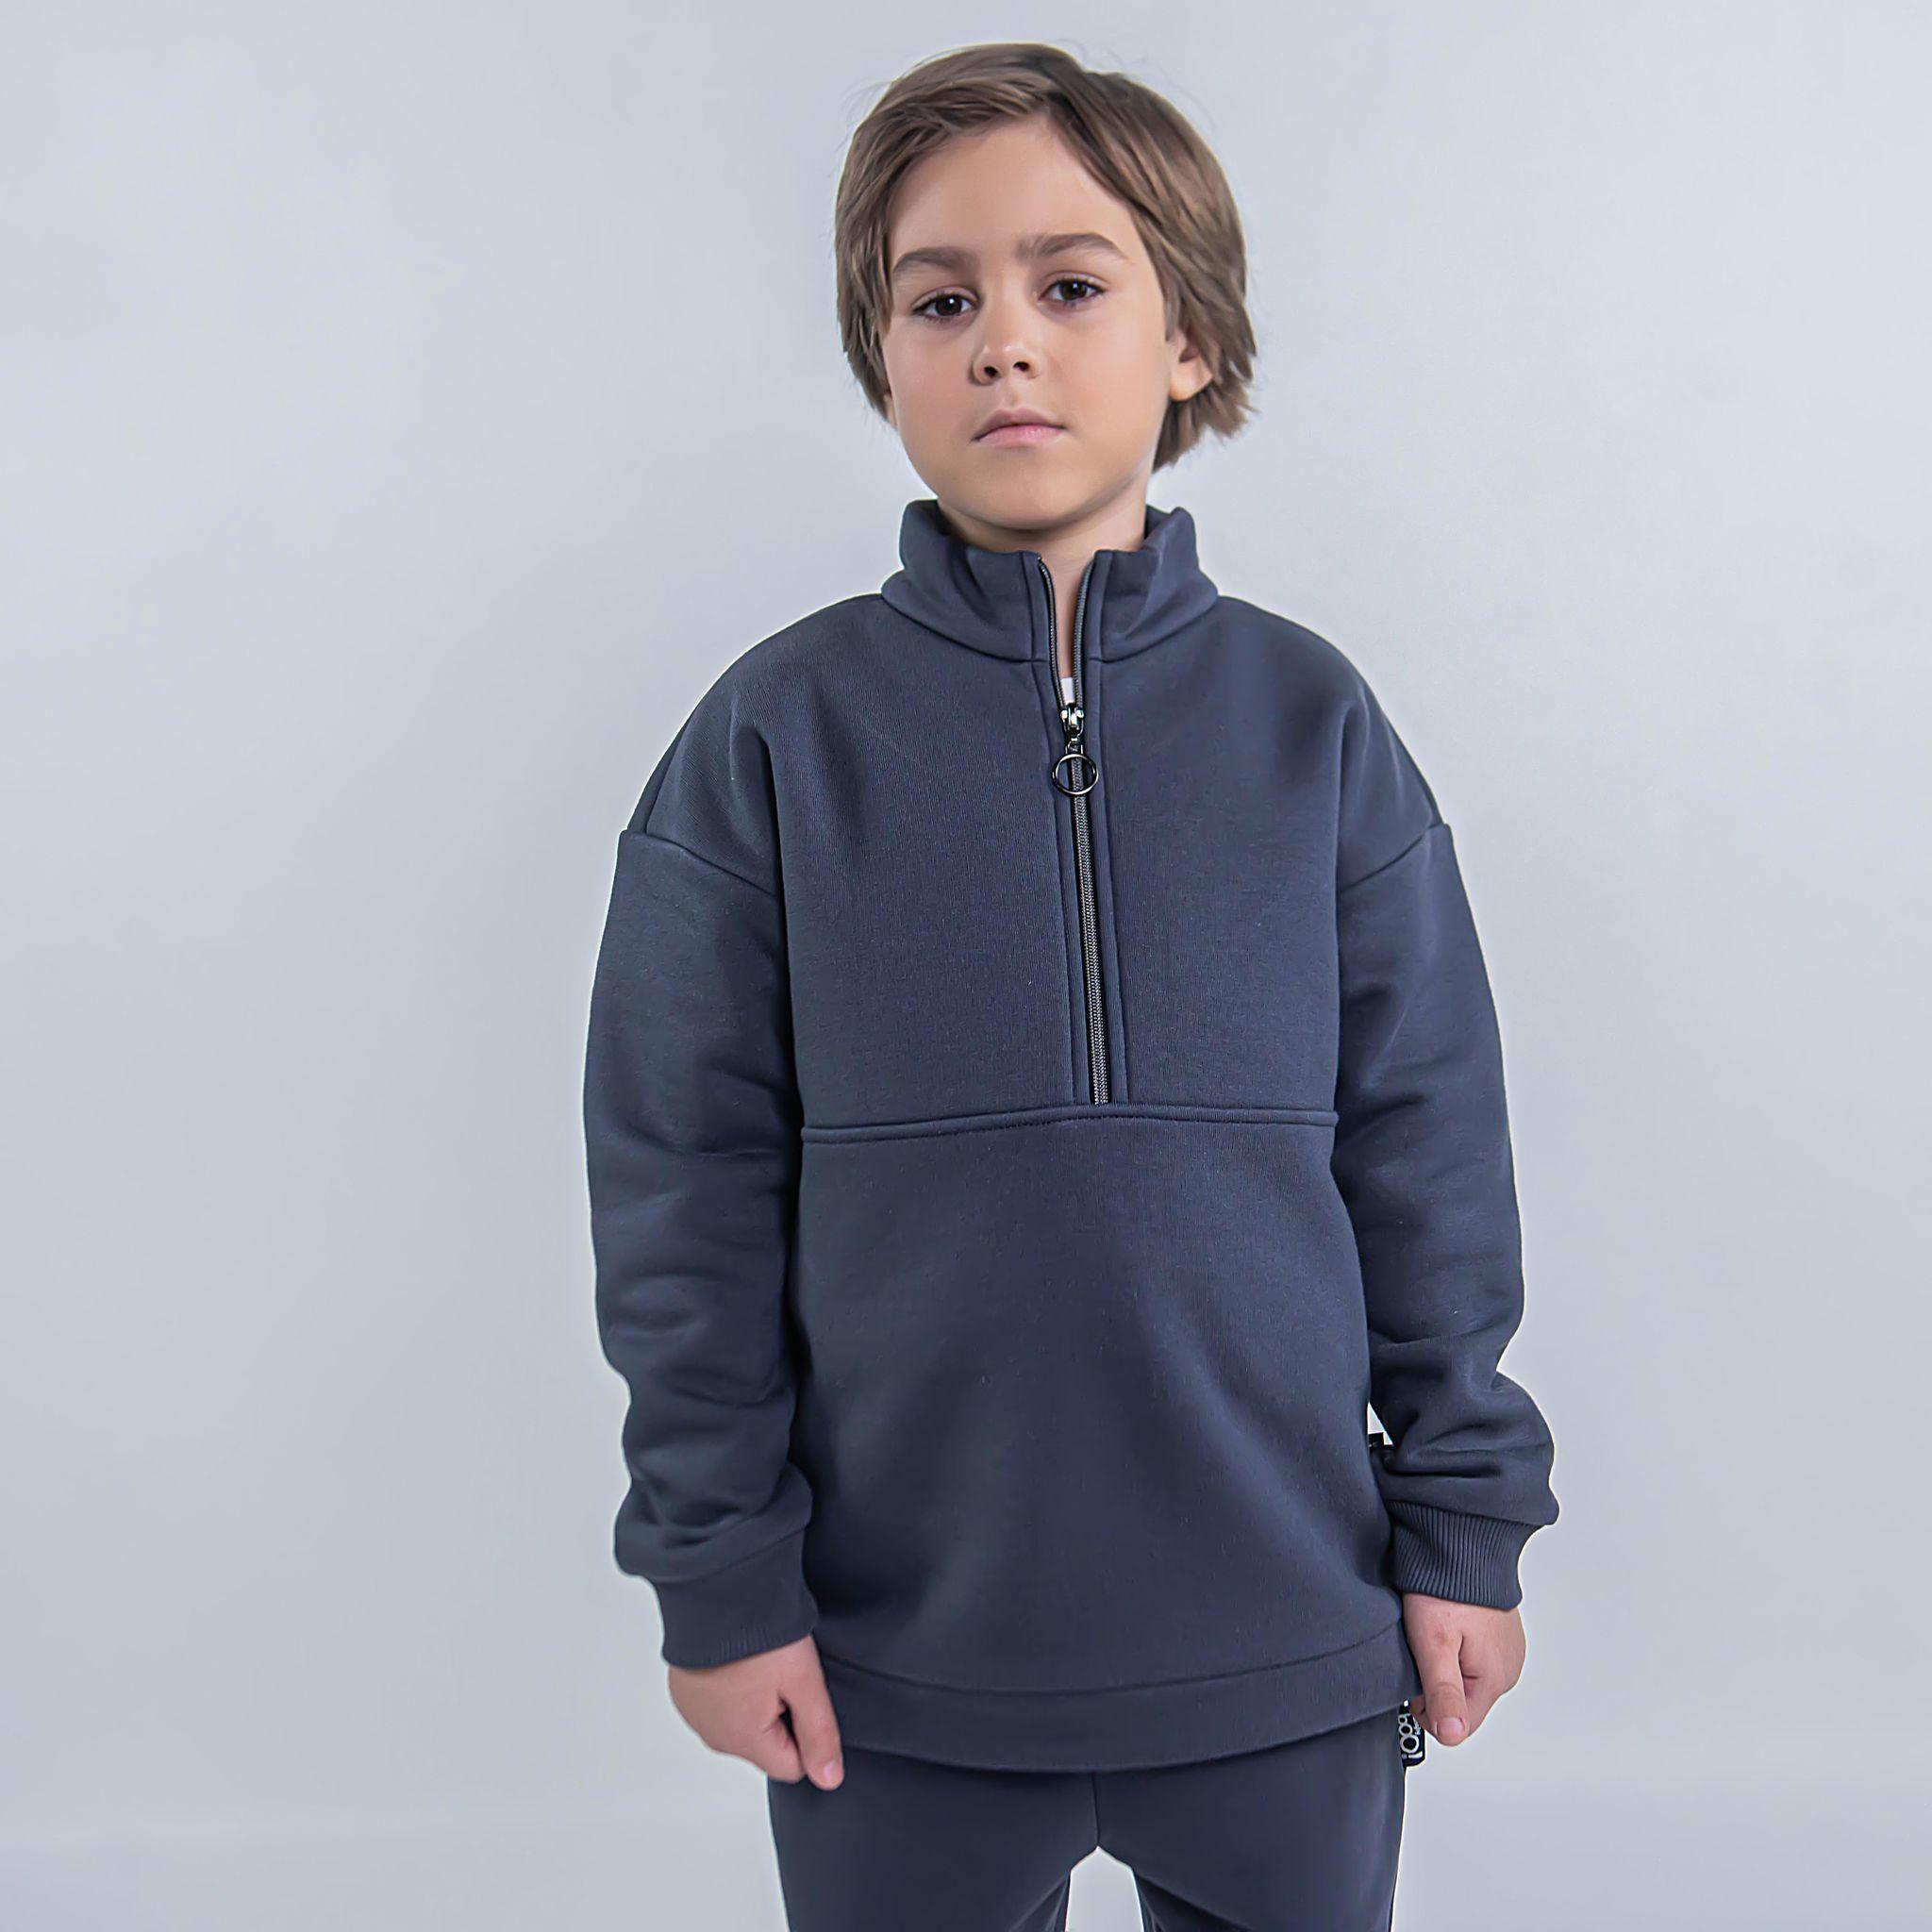 Warm sporty sweatshirt for teens - Graphite